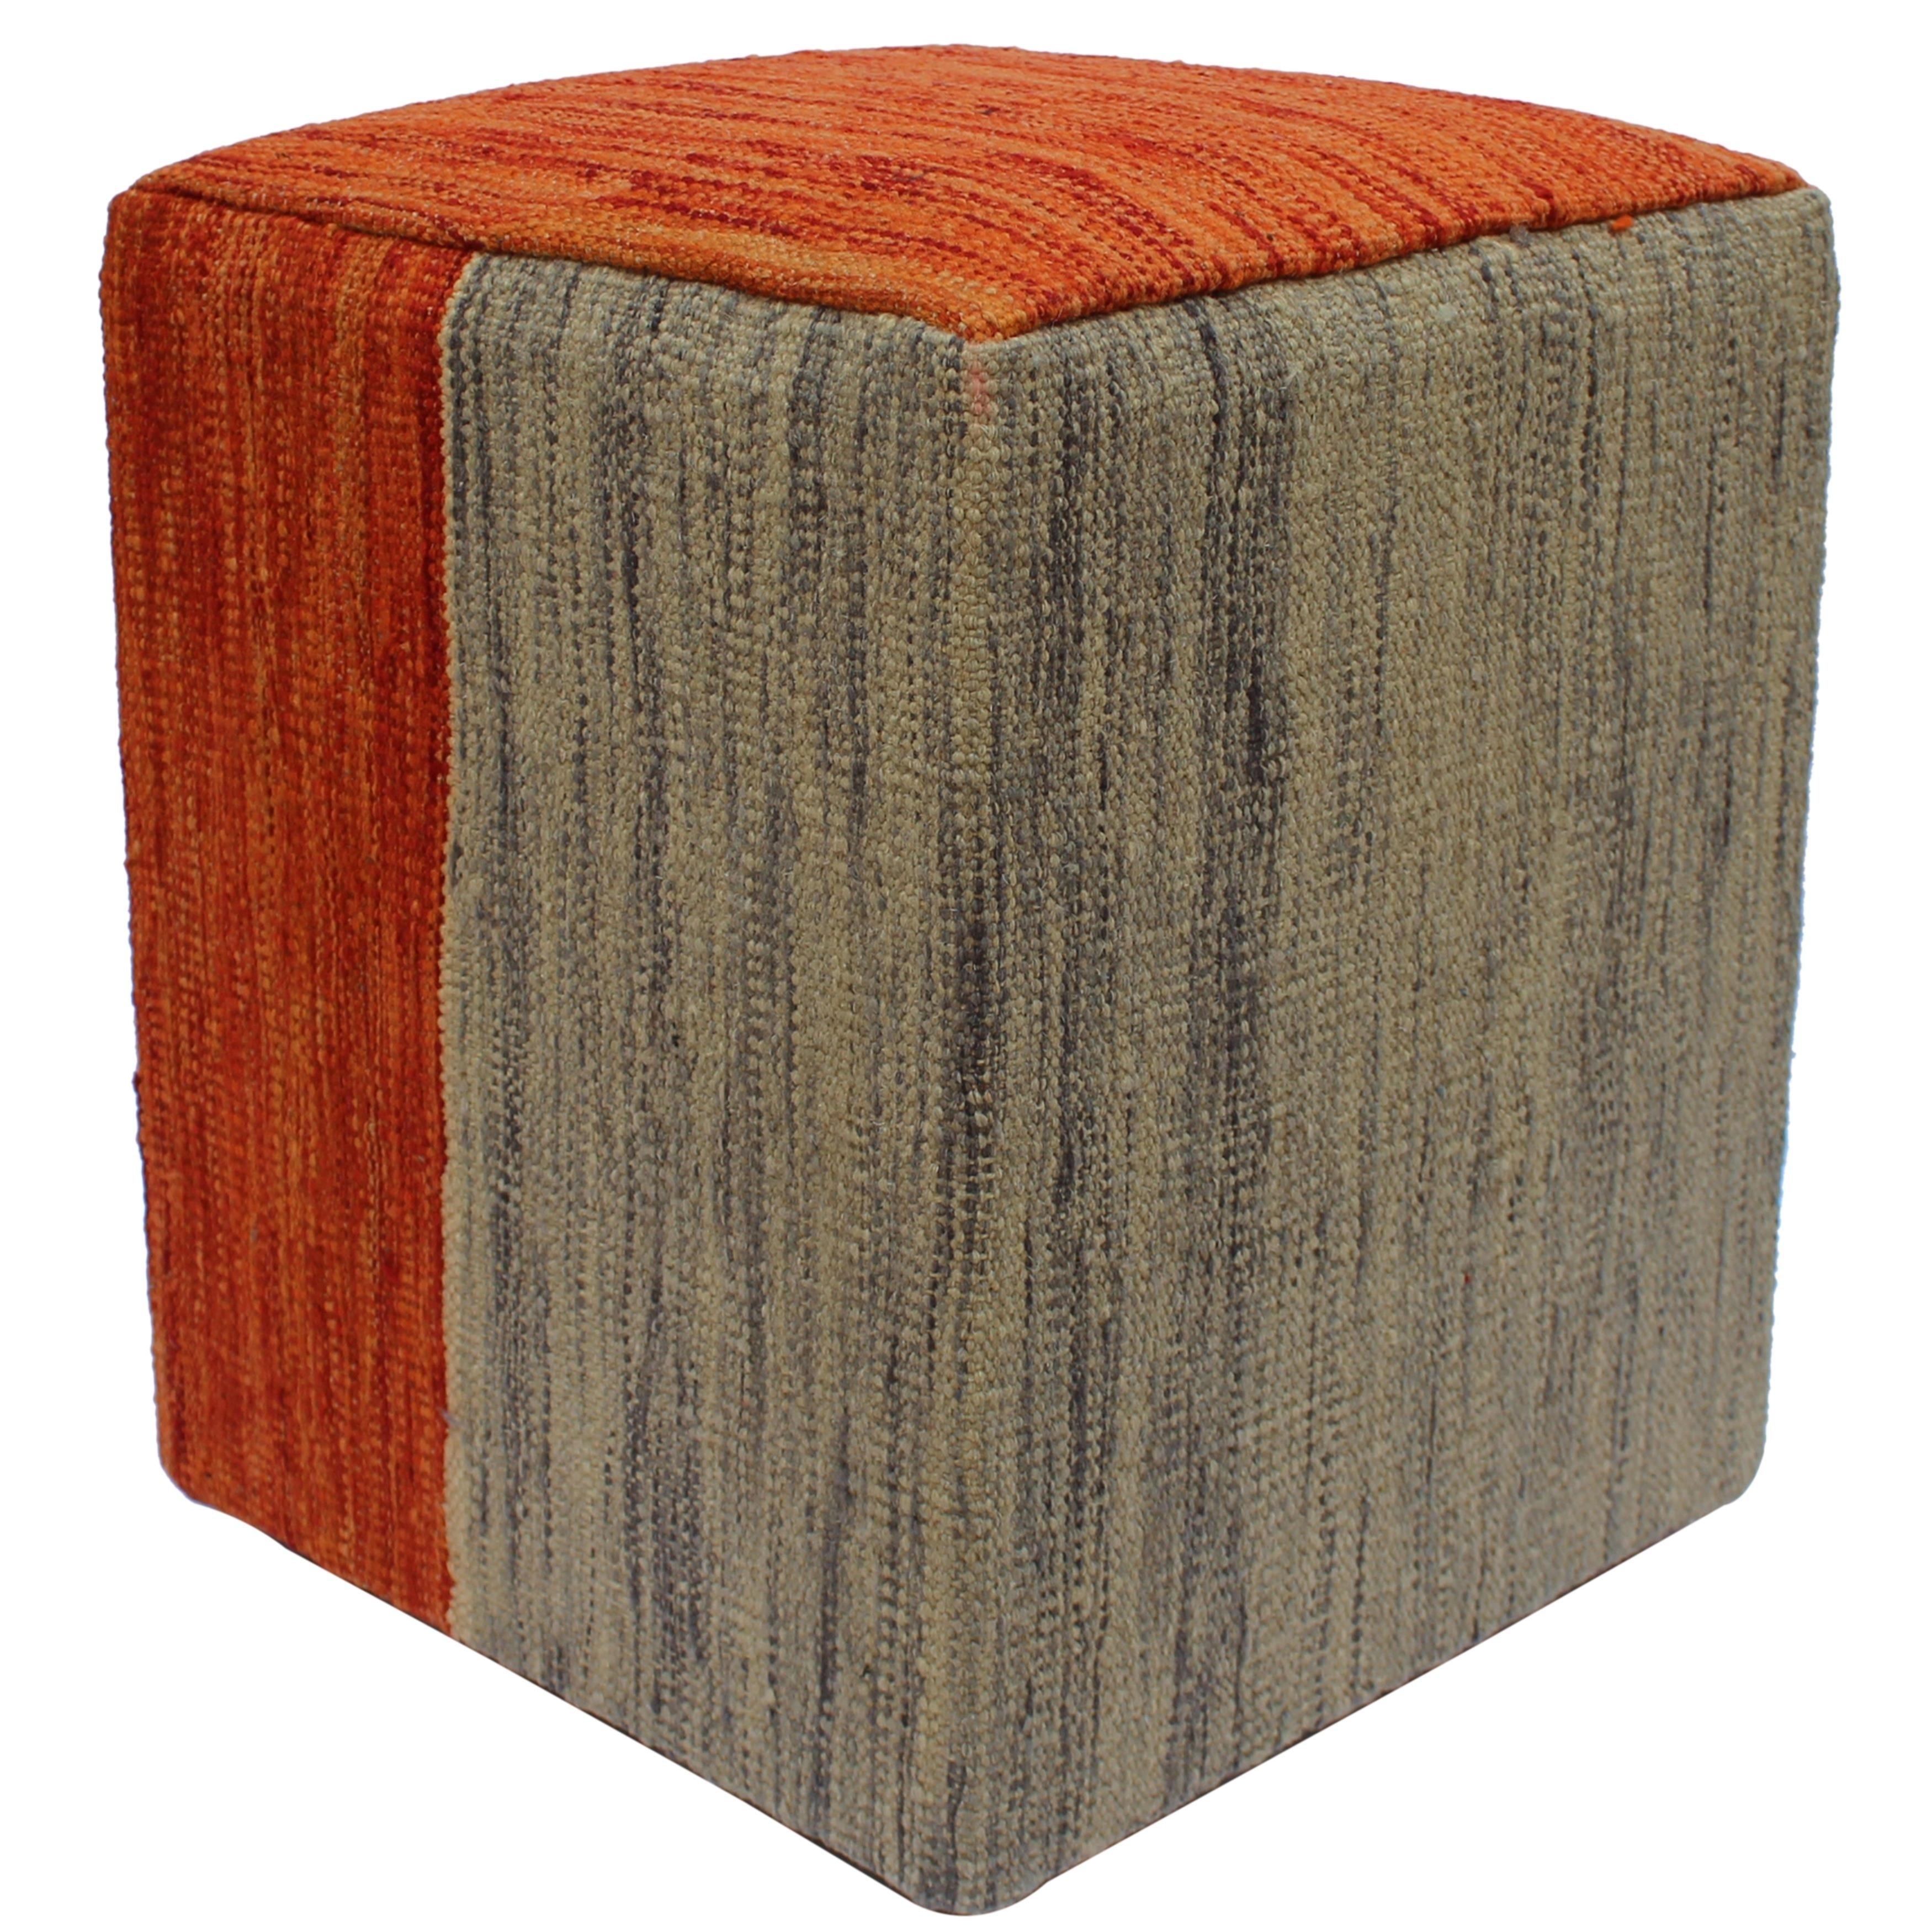 the latest 3b896 5af7f Arshs Fine Rugs High Orange/Grey Handmade Kilim Upholstered Ottoman